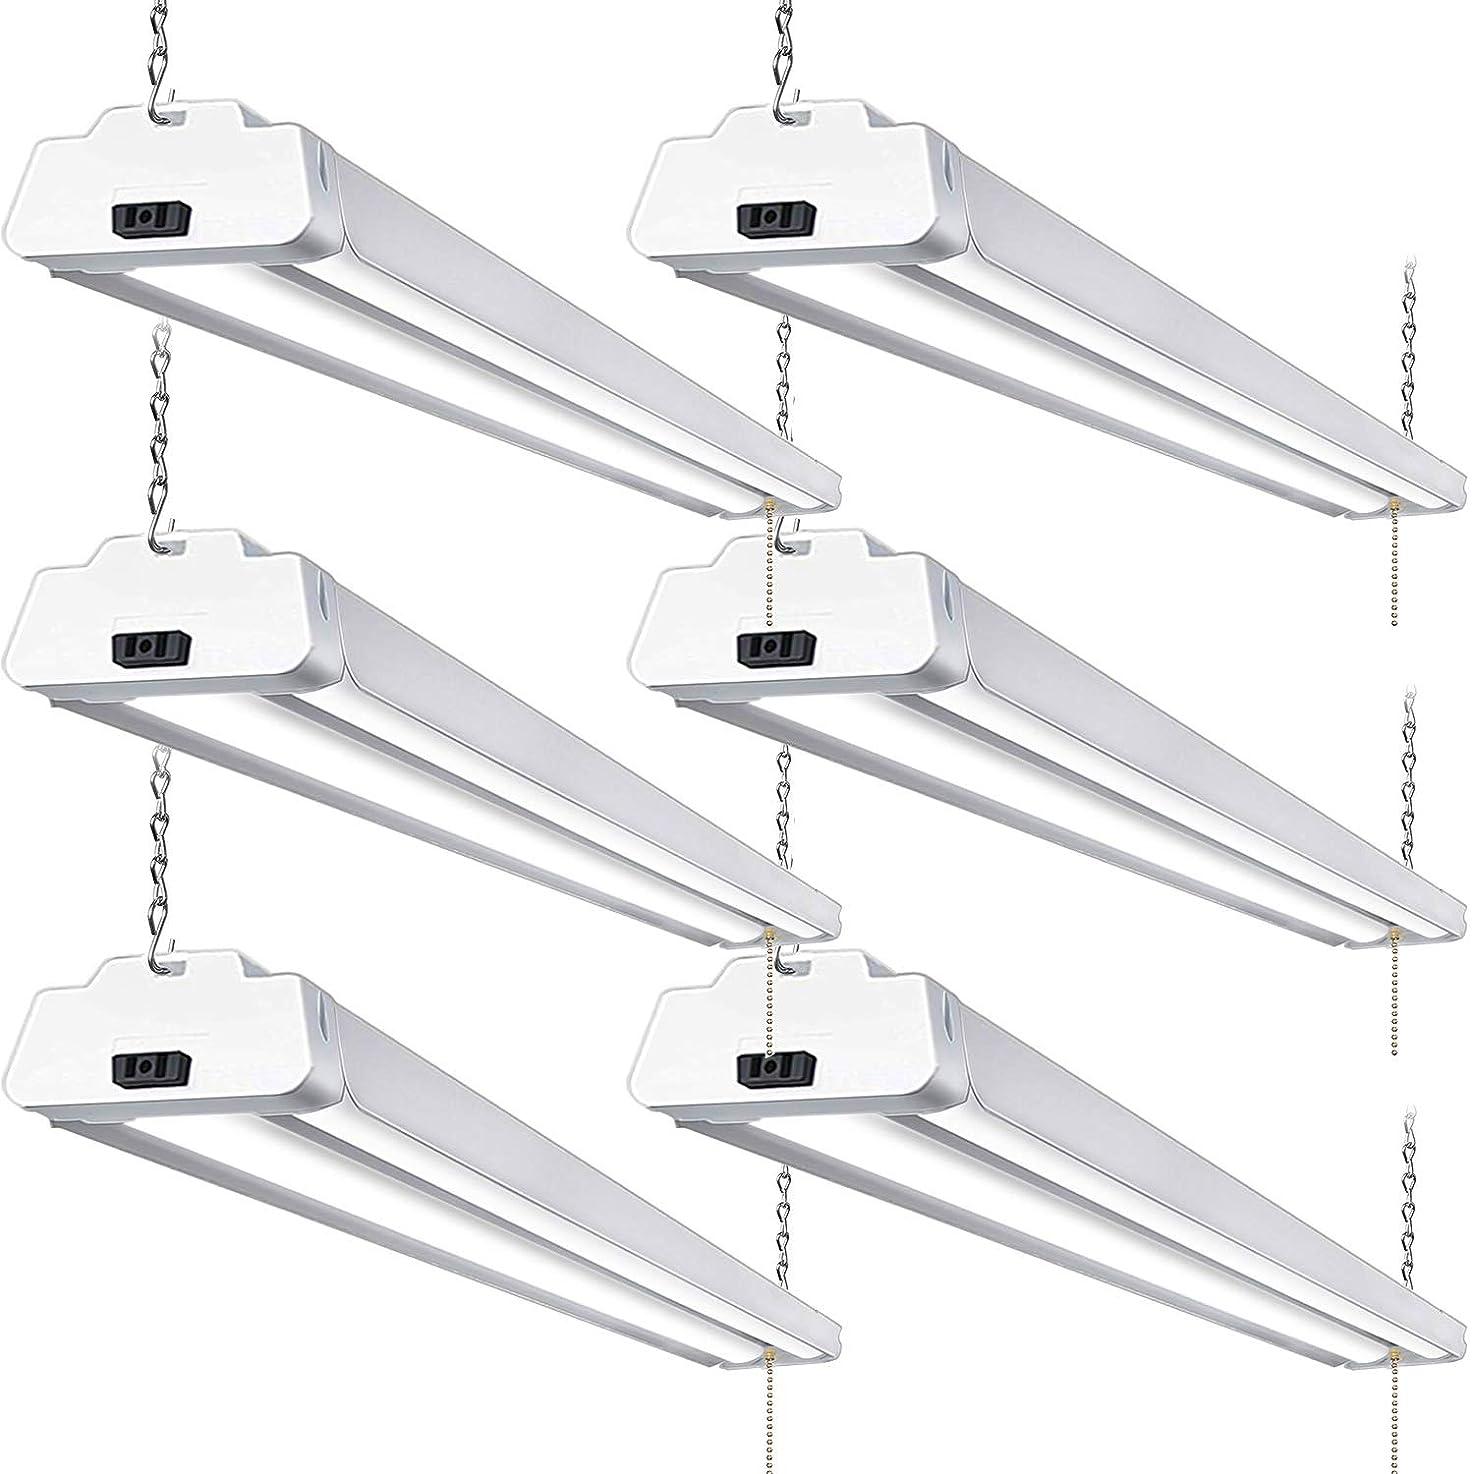 Hykolity 5000K LED Shop Light Linkable, 4FT Daylight 42W LED Ceiling Lights for Garages, Workshops, Basements, Hanging or FlushMount, with Plug and Pull Chain, 3700lm, ETL- 6 Pack